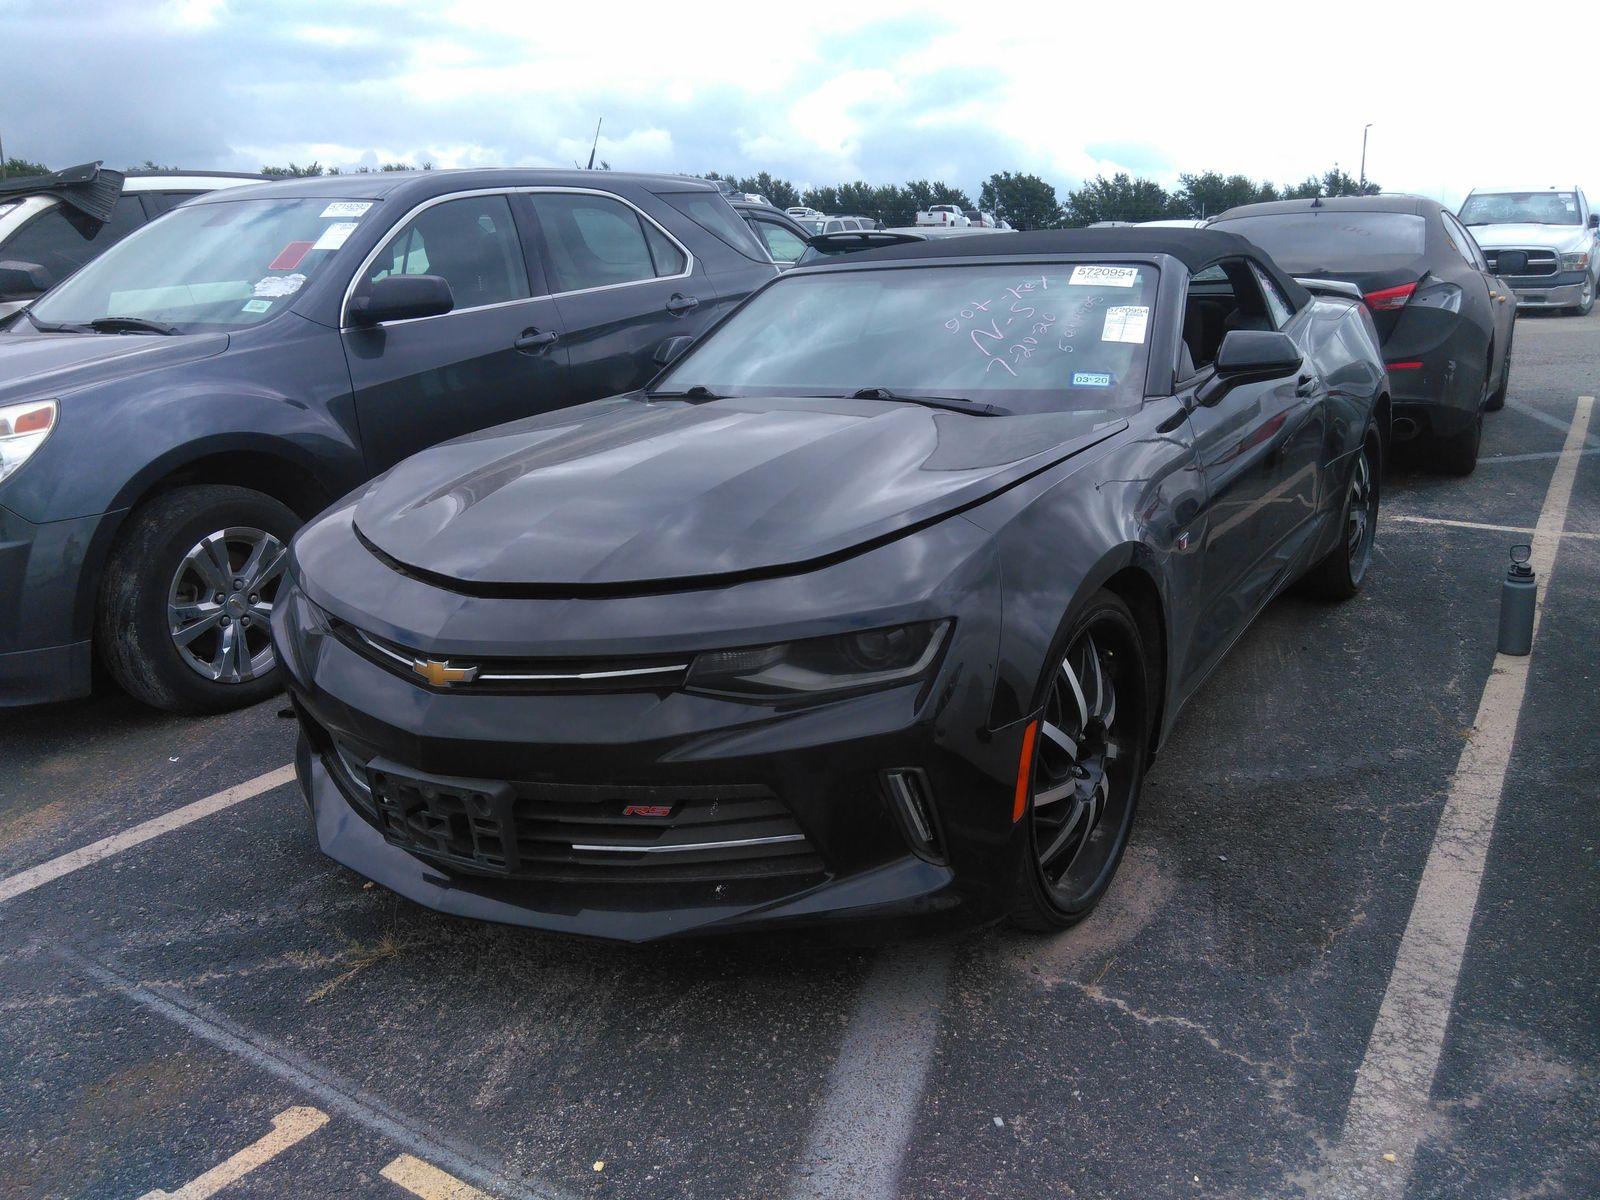 2018 Chevrolet Camaro 3.6. Lot 99918133202 Vin 1G1FB3DS5J0162587